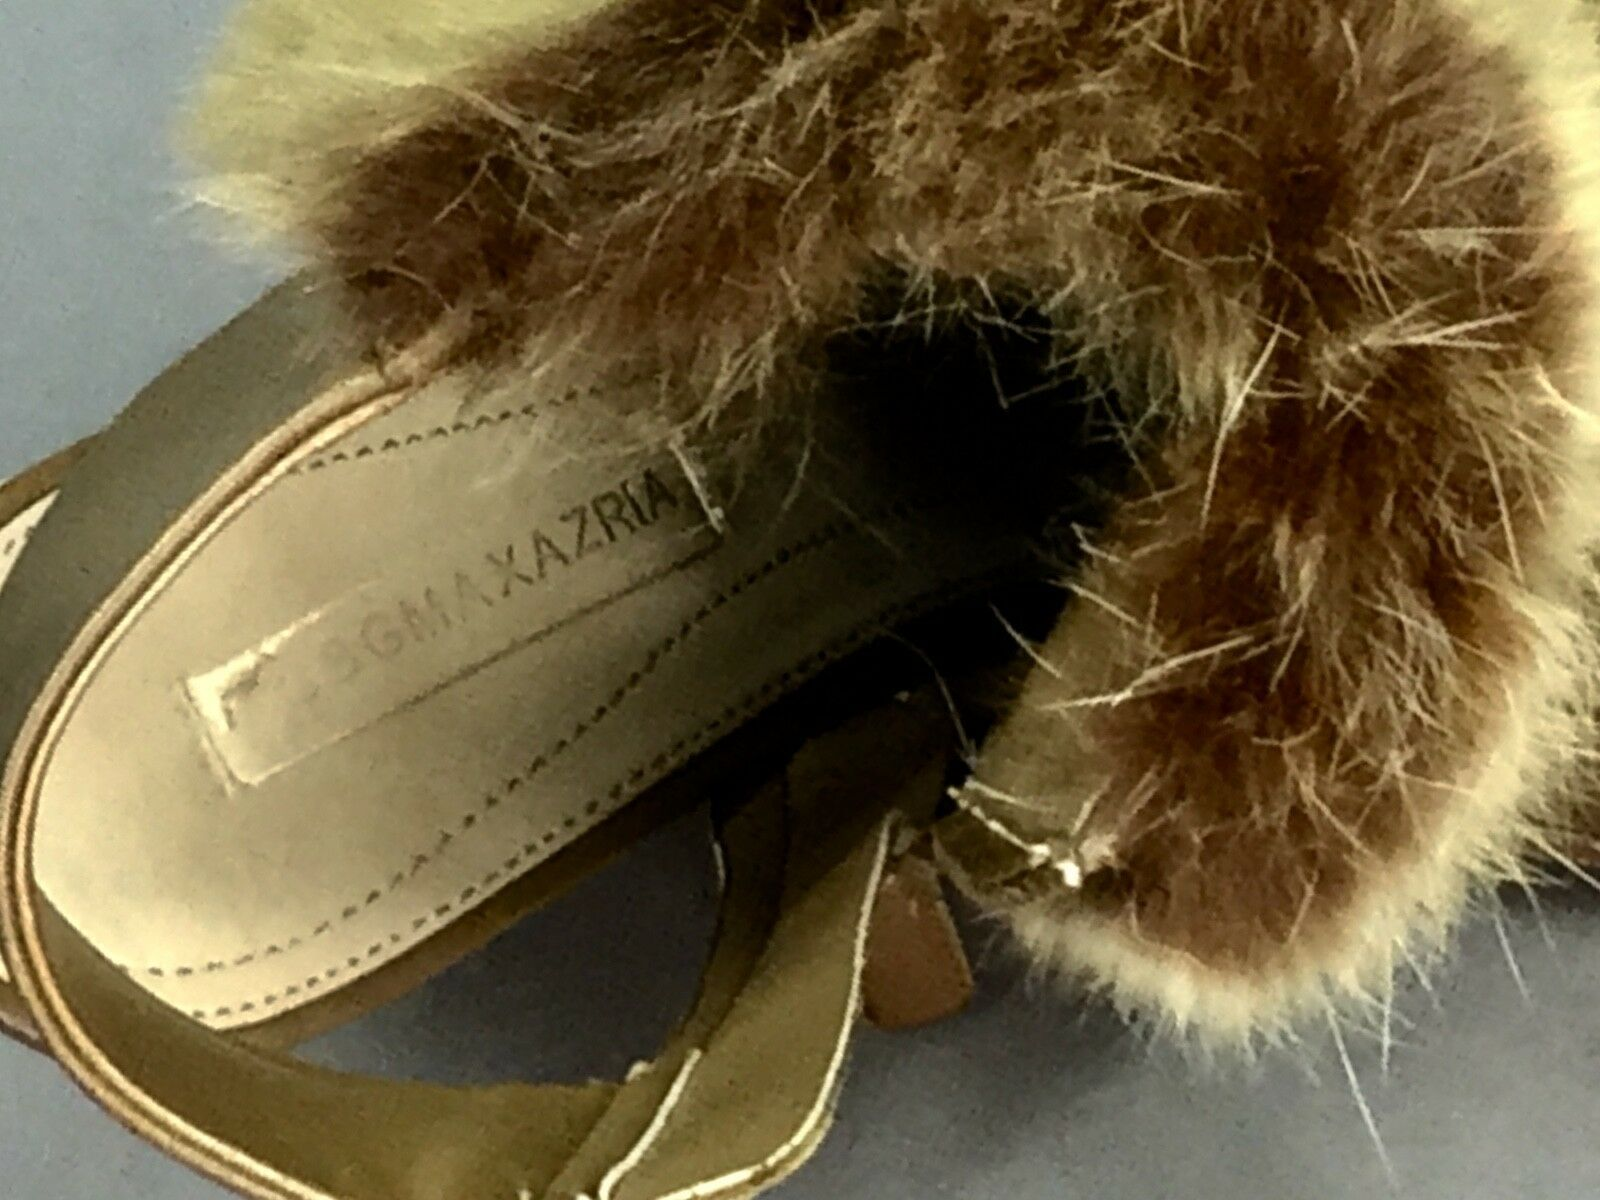 BCBG MAX AZRIA RUNWAY TASIA RABBIT FUR HIGH HEEL OPEN BACK CAMEL BOOTIE Size 9 M